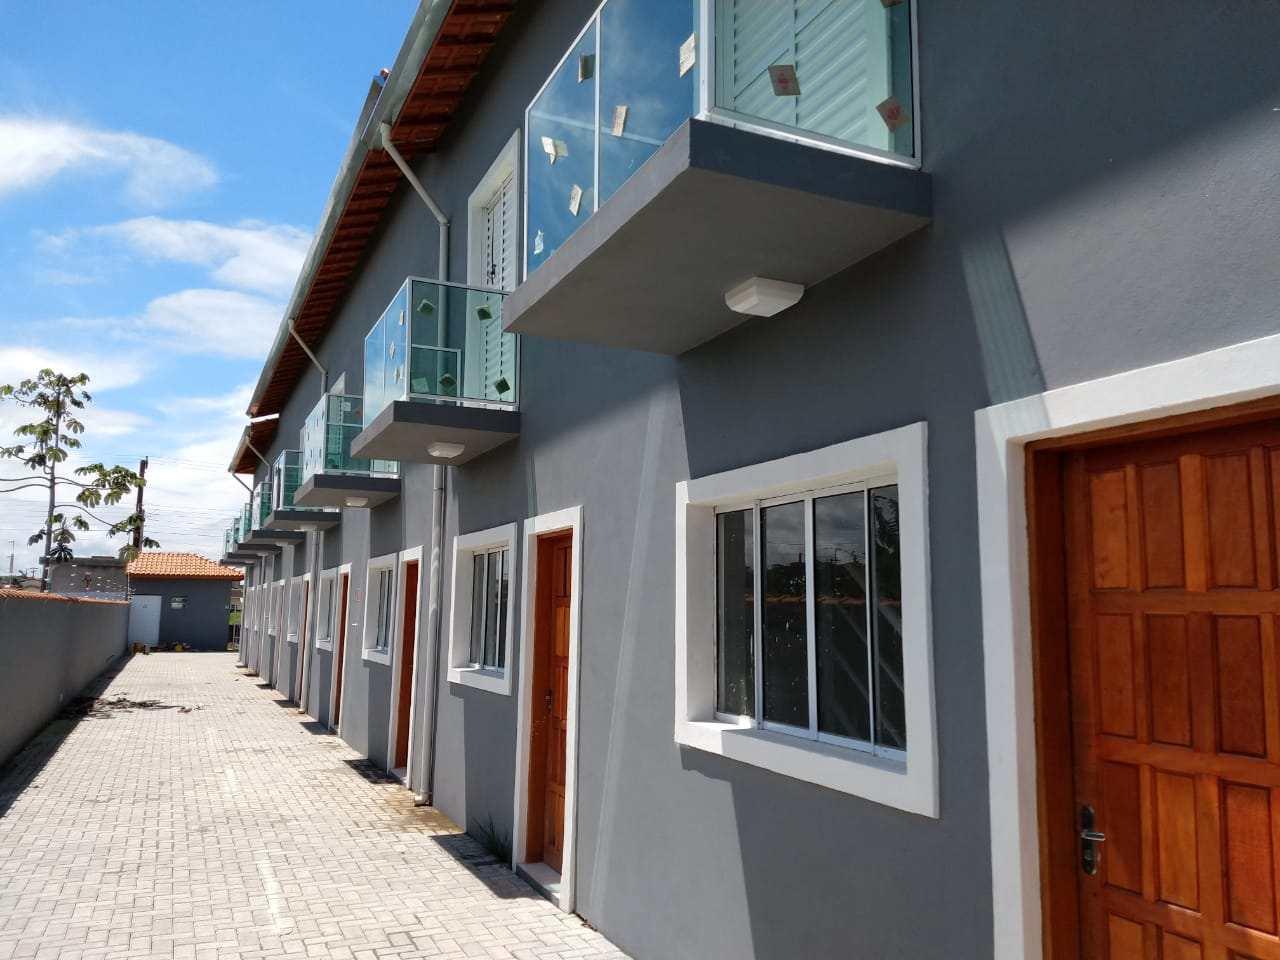 Casa com 2 dorms, cibratel 2, Itanhaém - R$ 169 mil, Cod: 1141